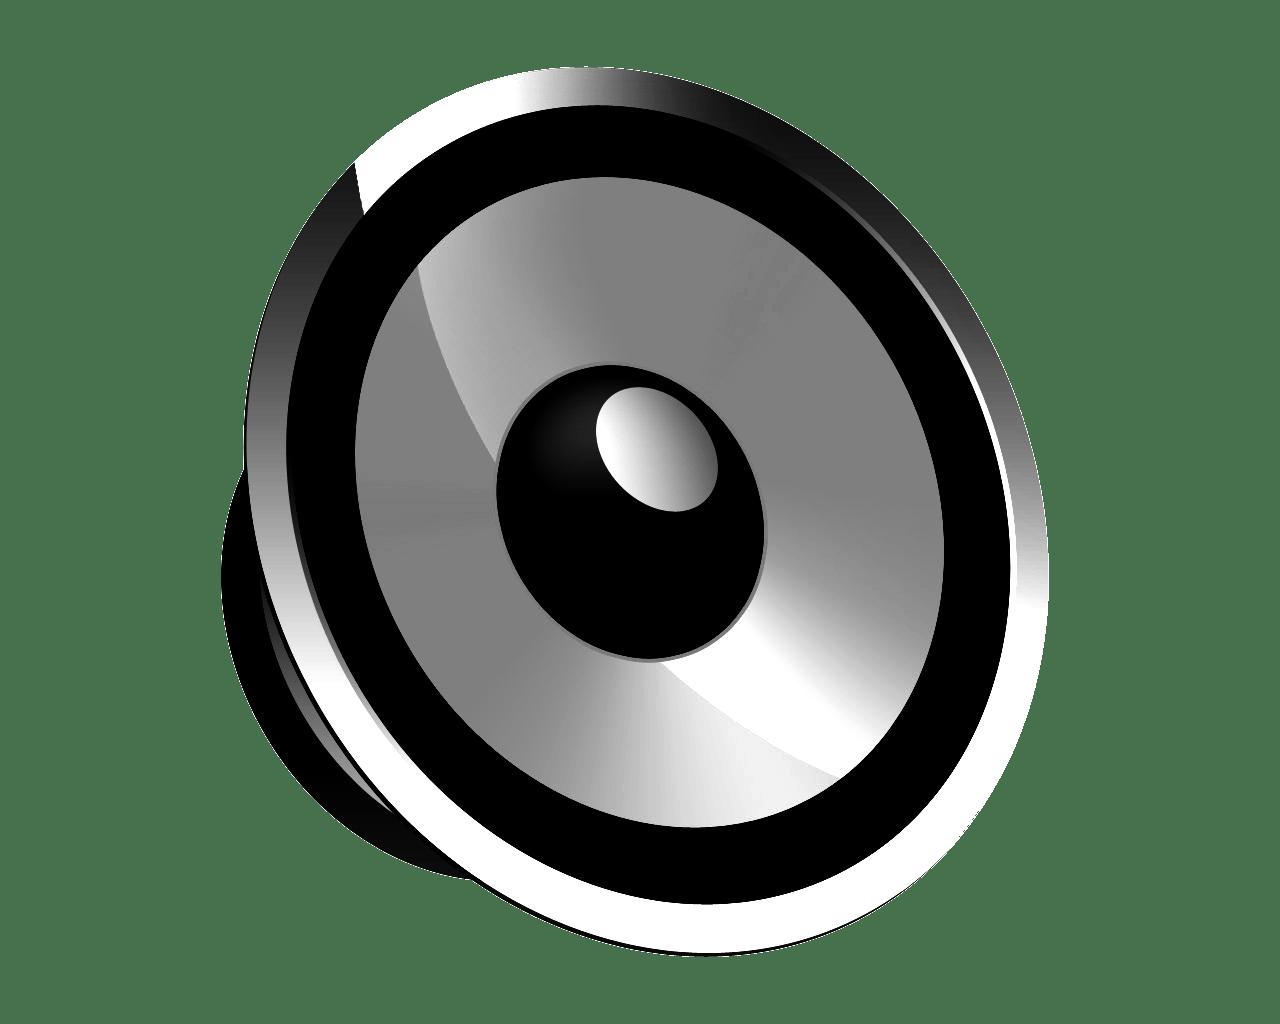 dj speaker Google Search graphic Pinterest Search